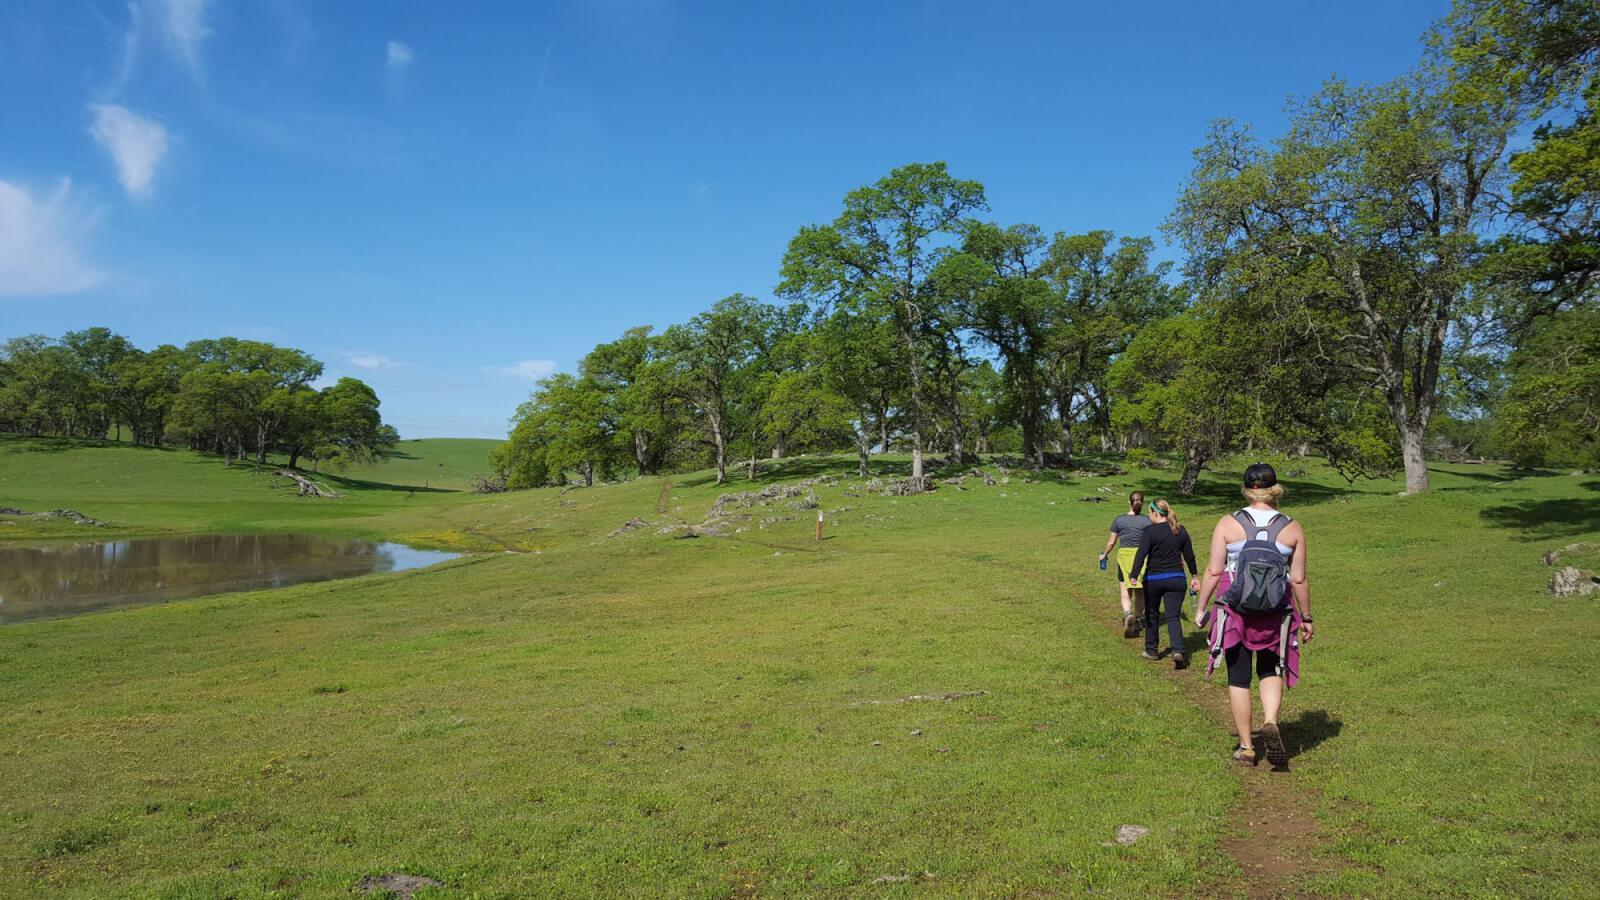 people hiking in meadow